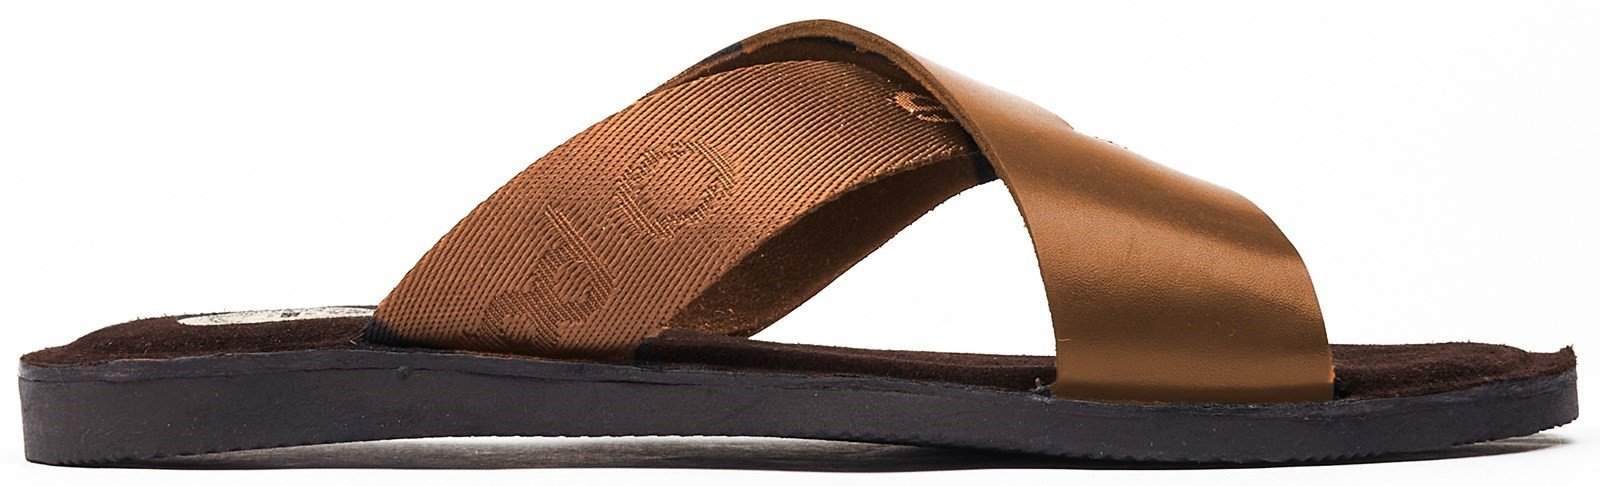 Base London Men's Miso Slip On Sandal Various Colours 32261 - Tan 12